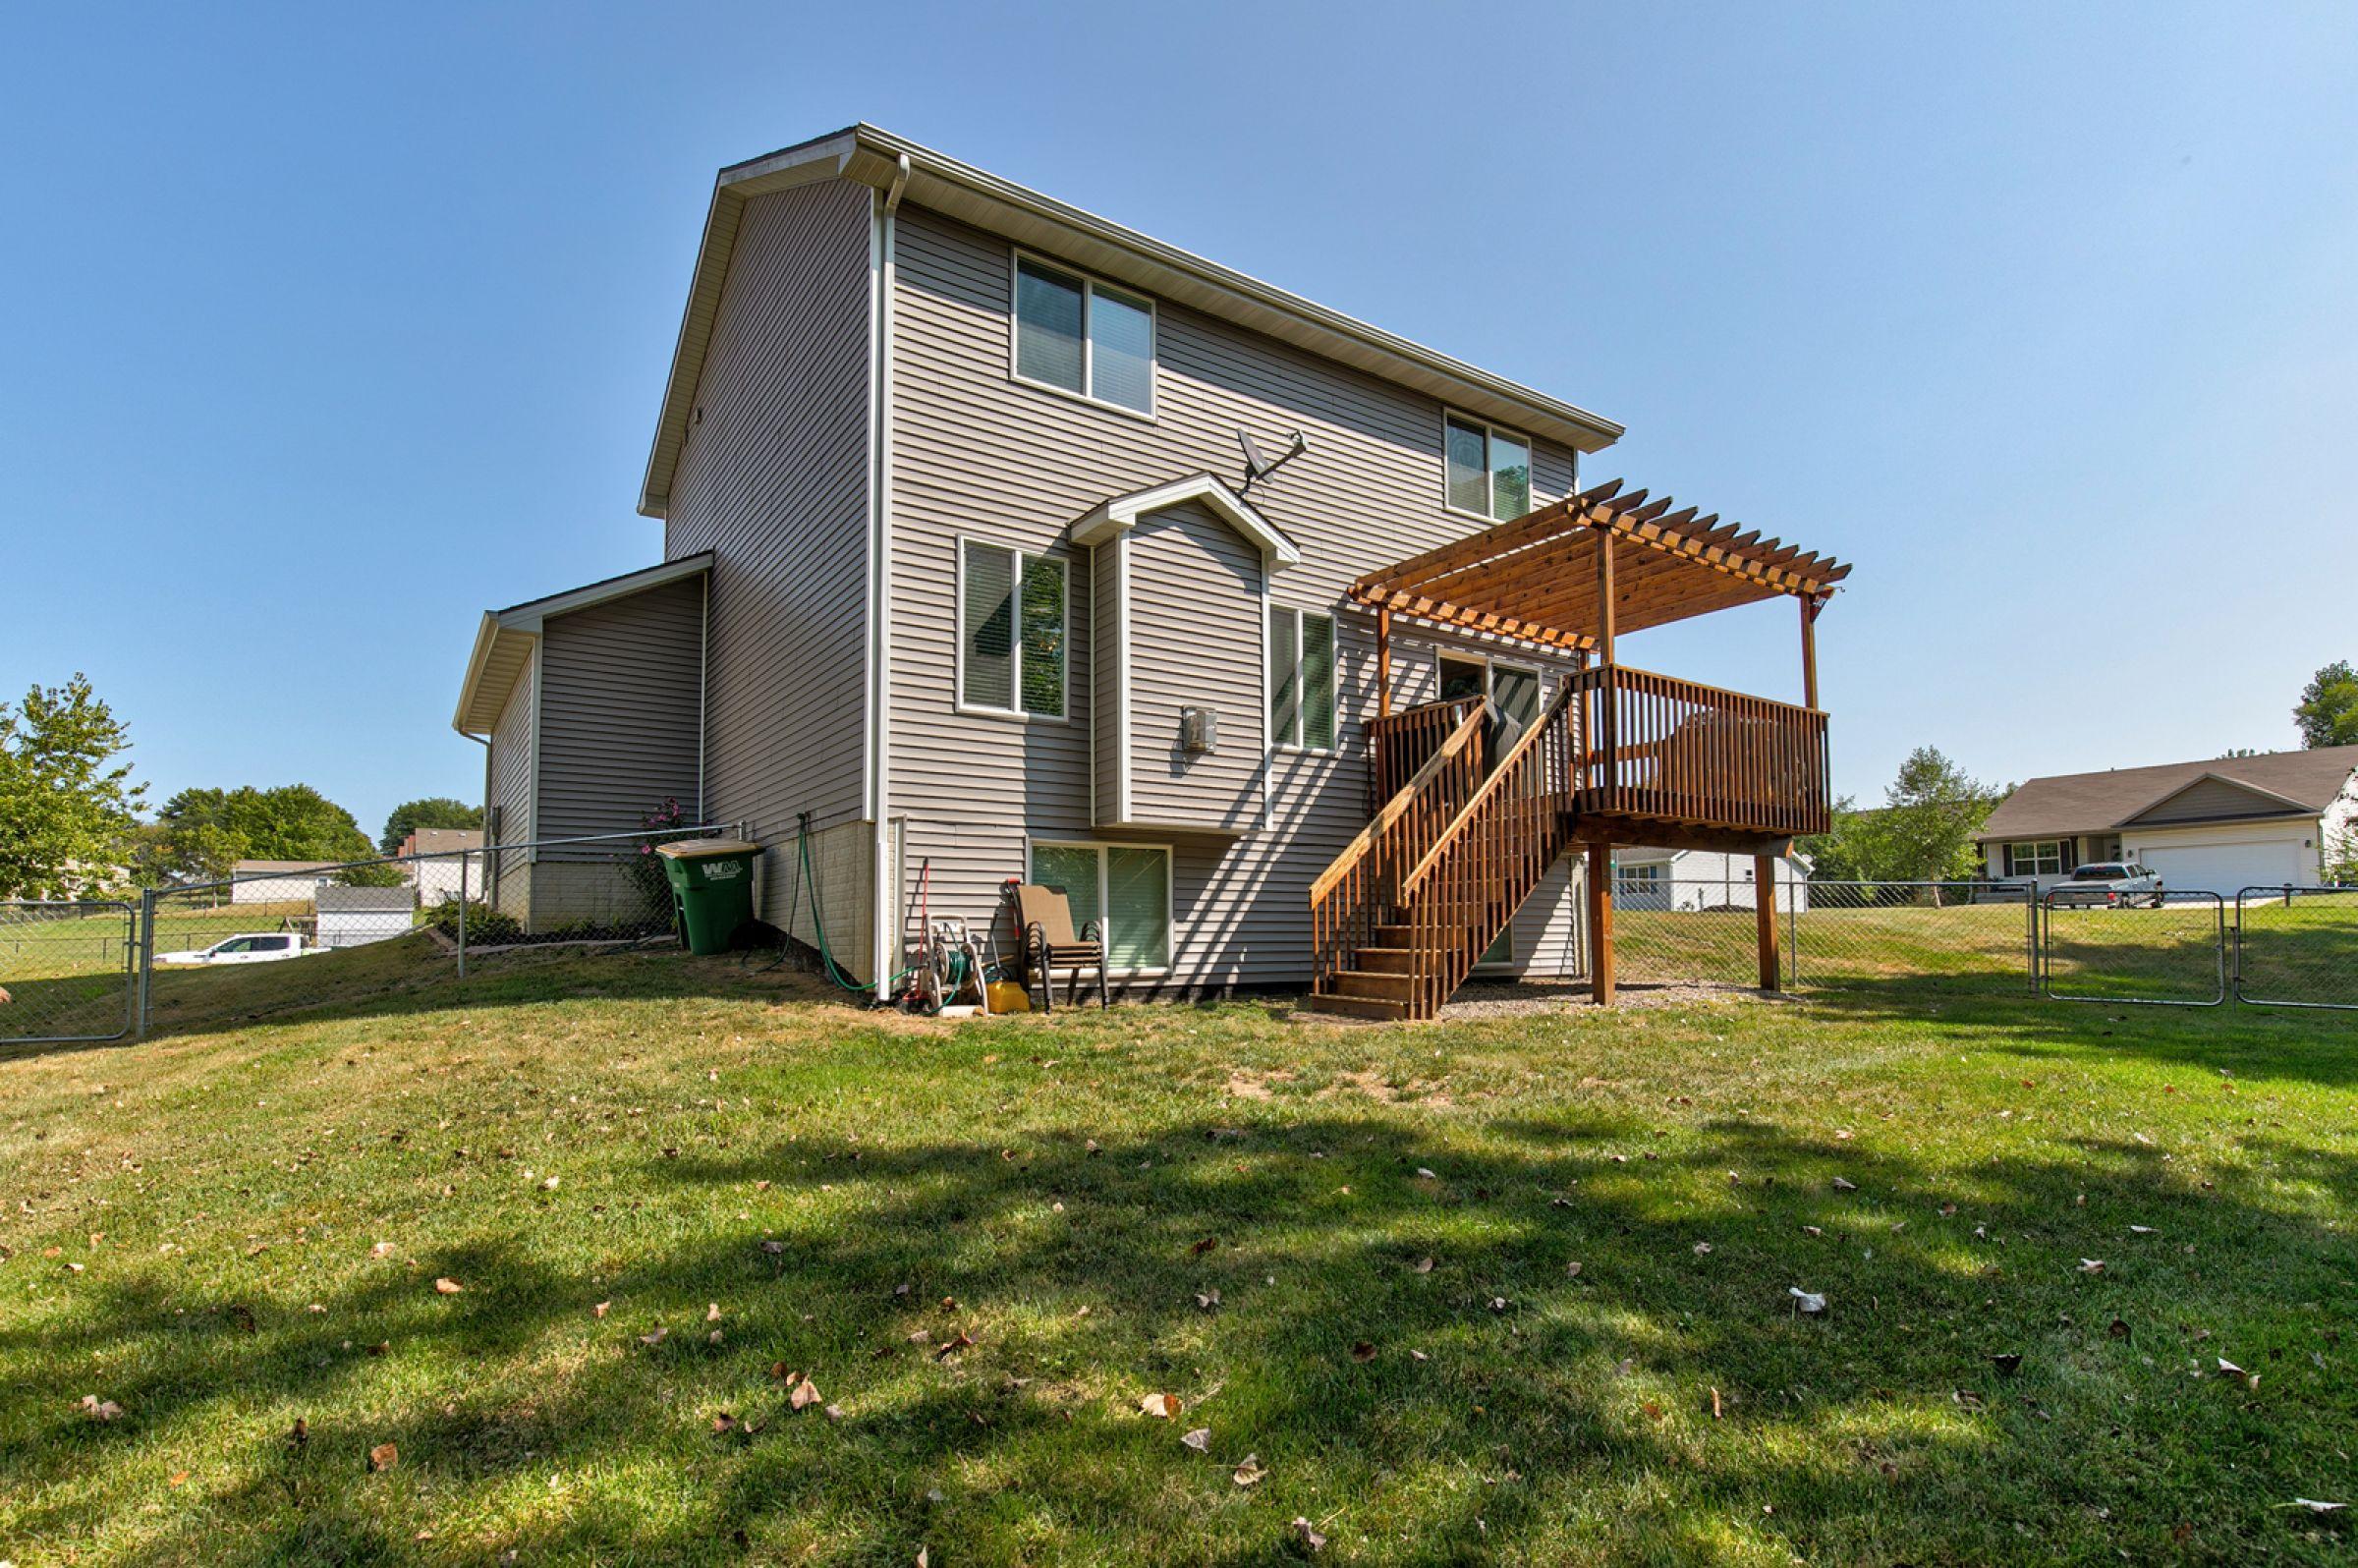 residential-warren-county-iowa-0-acres-listing-number-15685-1-2021-08-31-032506.jpg